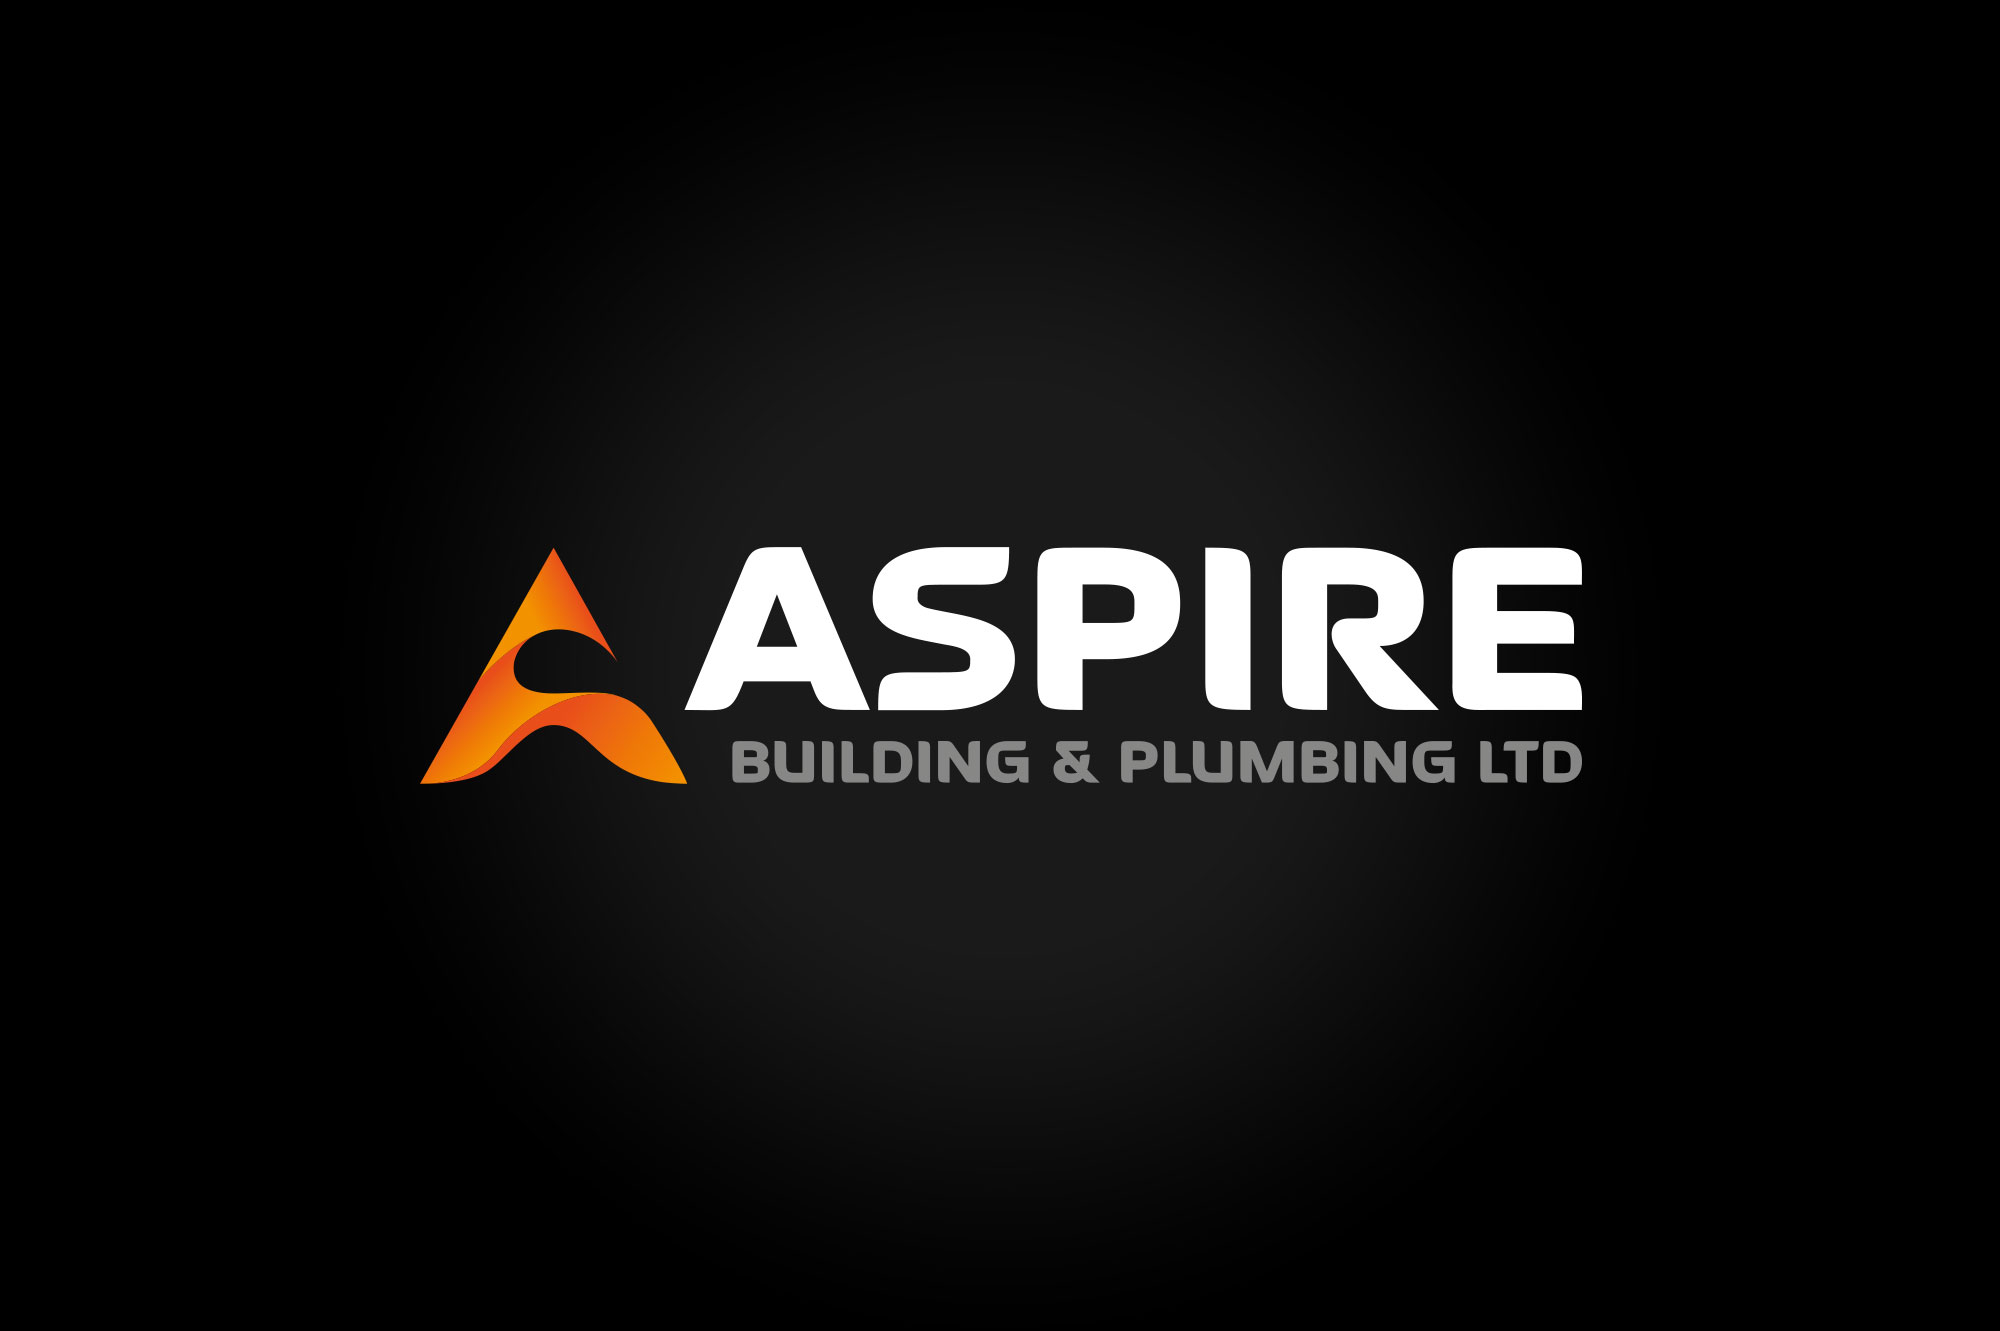 Aspire Building & Plumbing Logo Design